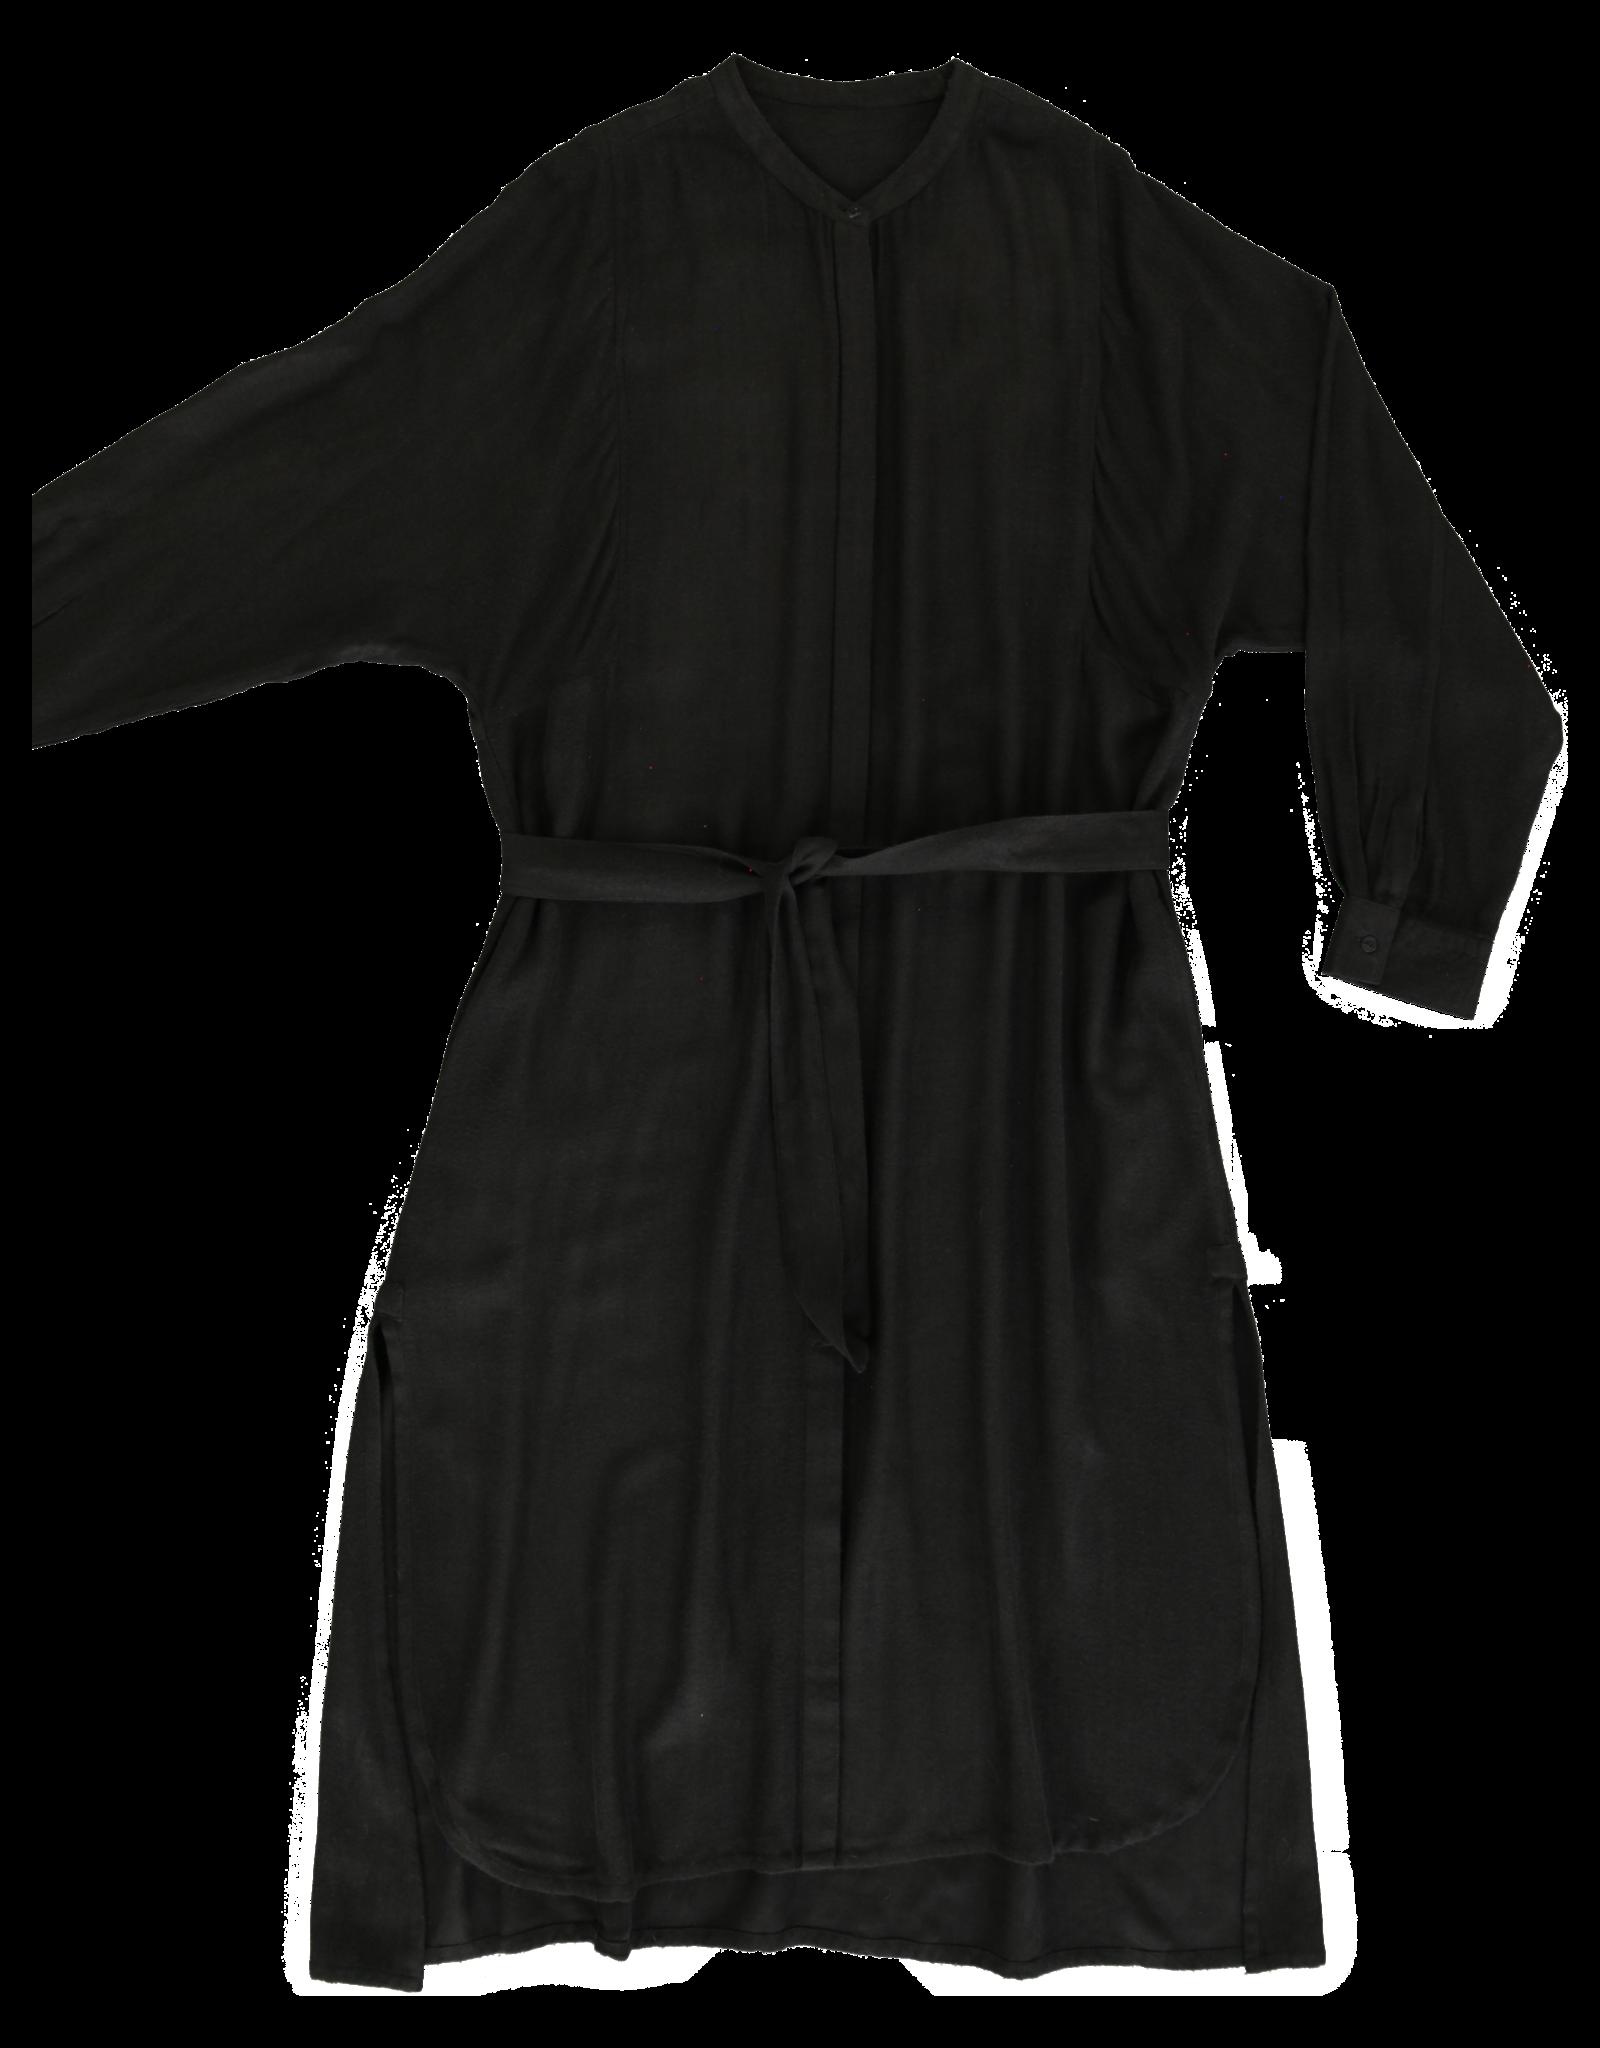 Dorélit Dee | Nightdress | Black